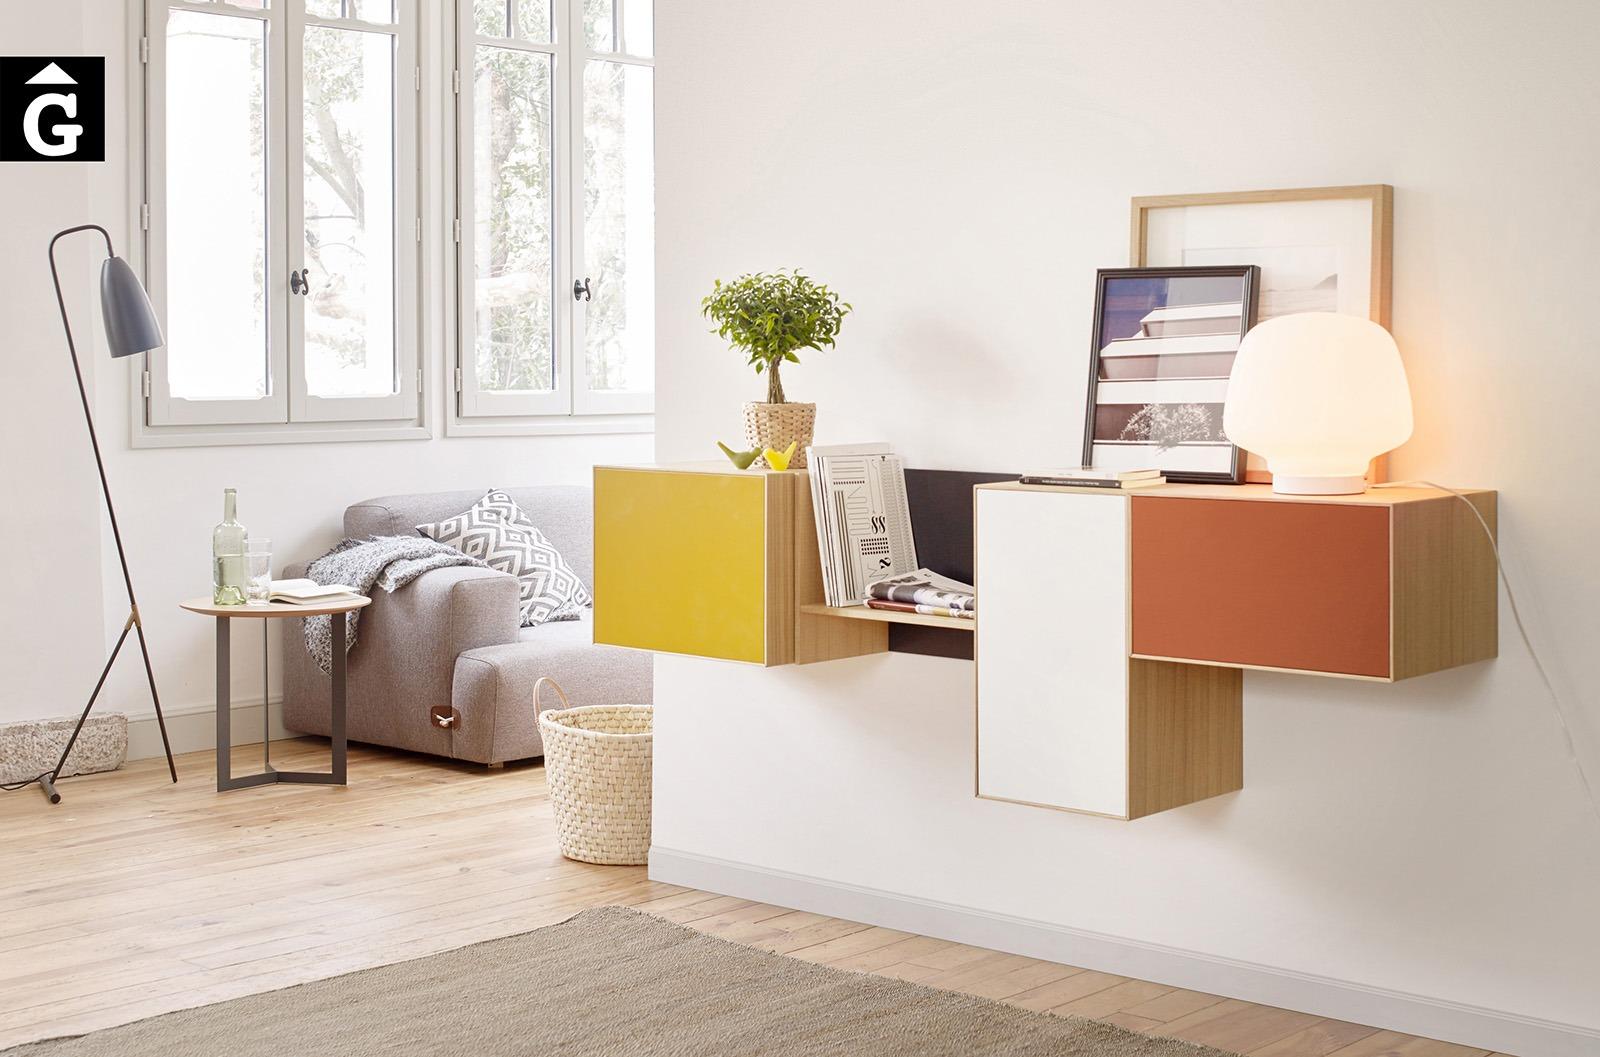 Rebedor lauki-programa-mobles-xapa-natural-i-laca-treku-by-mobles-gifreu